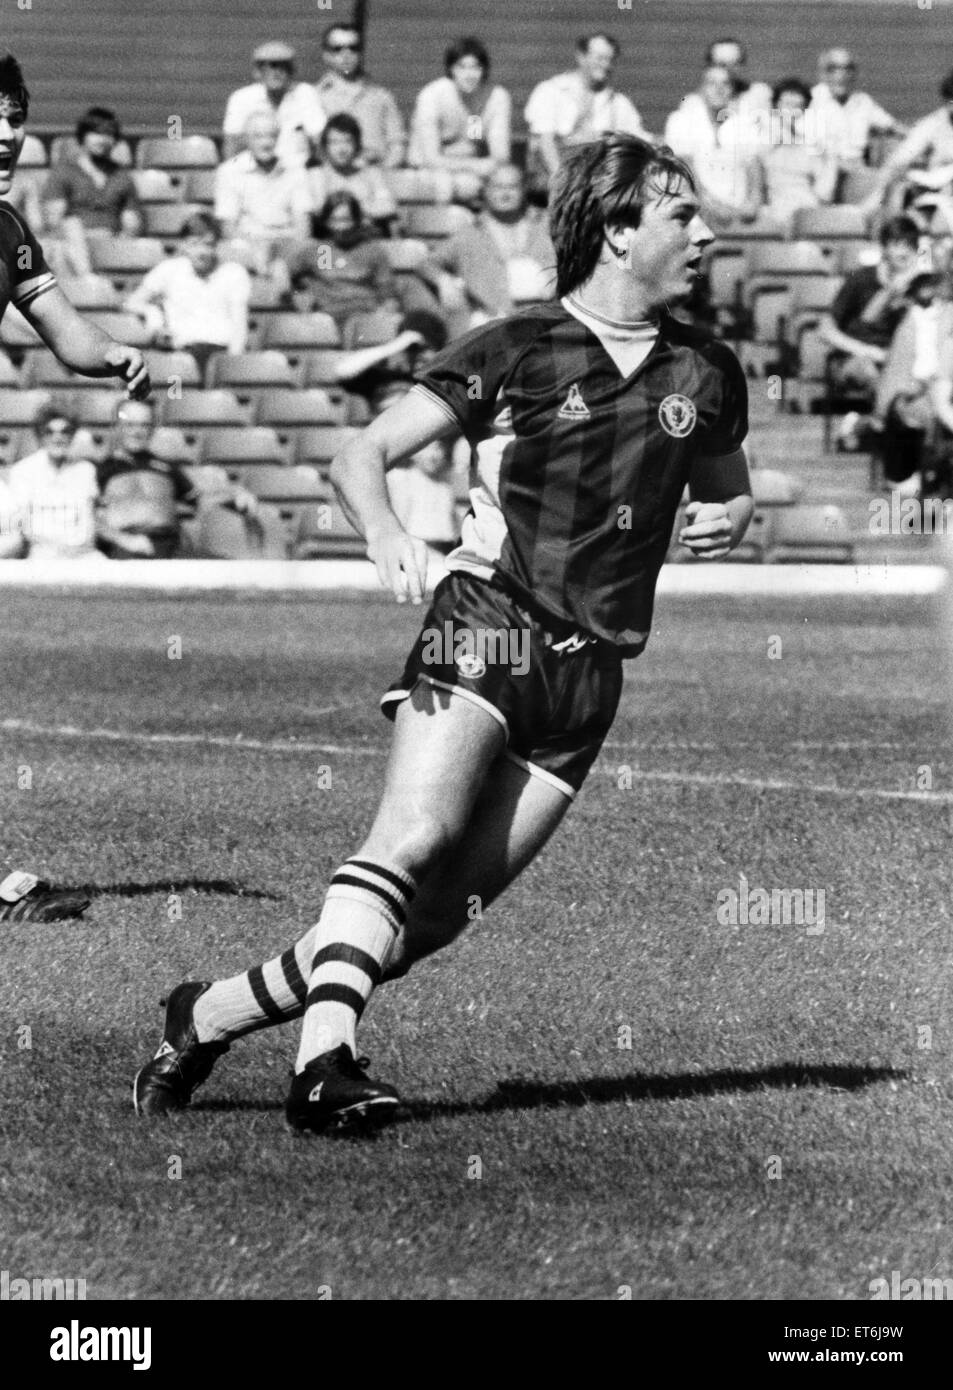 Steve McMahon, Aston Villa, Football Player, 1983-1985. Pre season friendly, 15th August 1983. - Stock Image